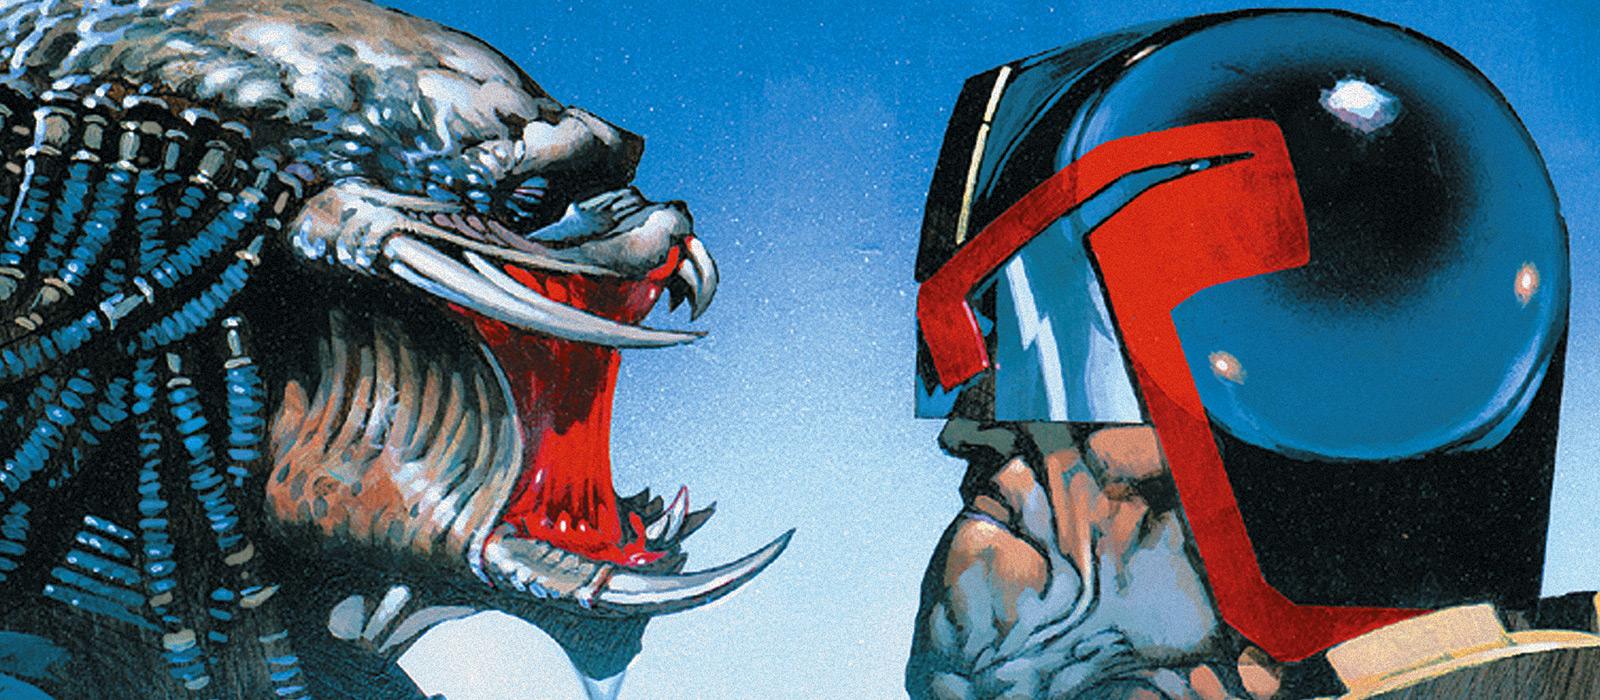 Permalink to: Judge Dredd / Predator : Confrontation